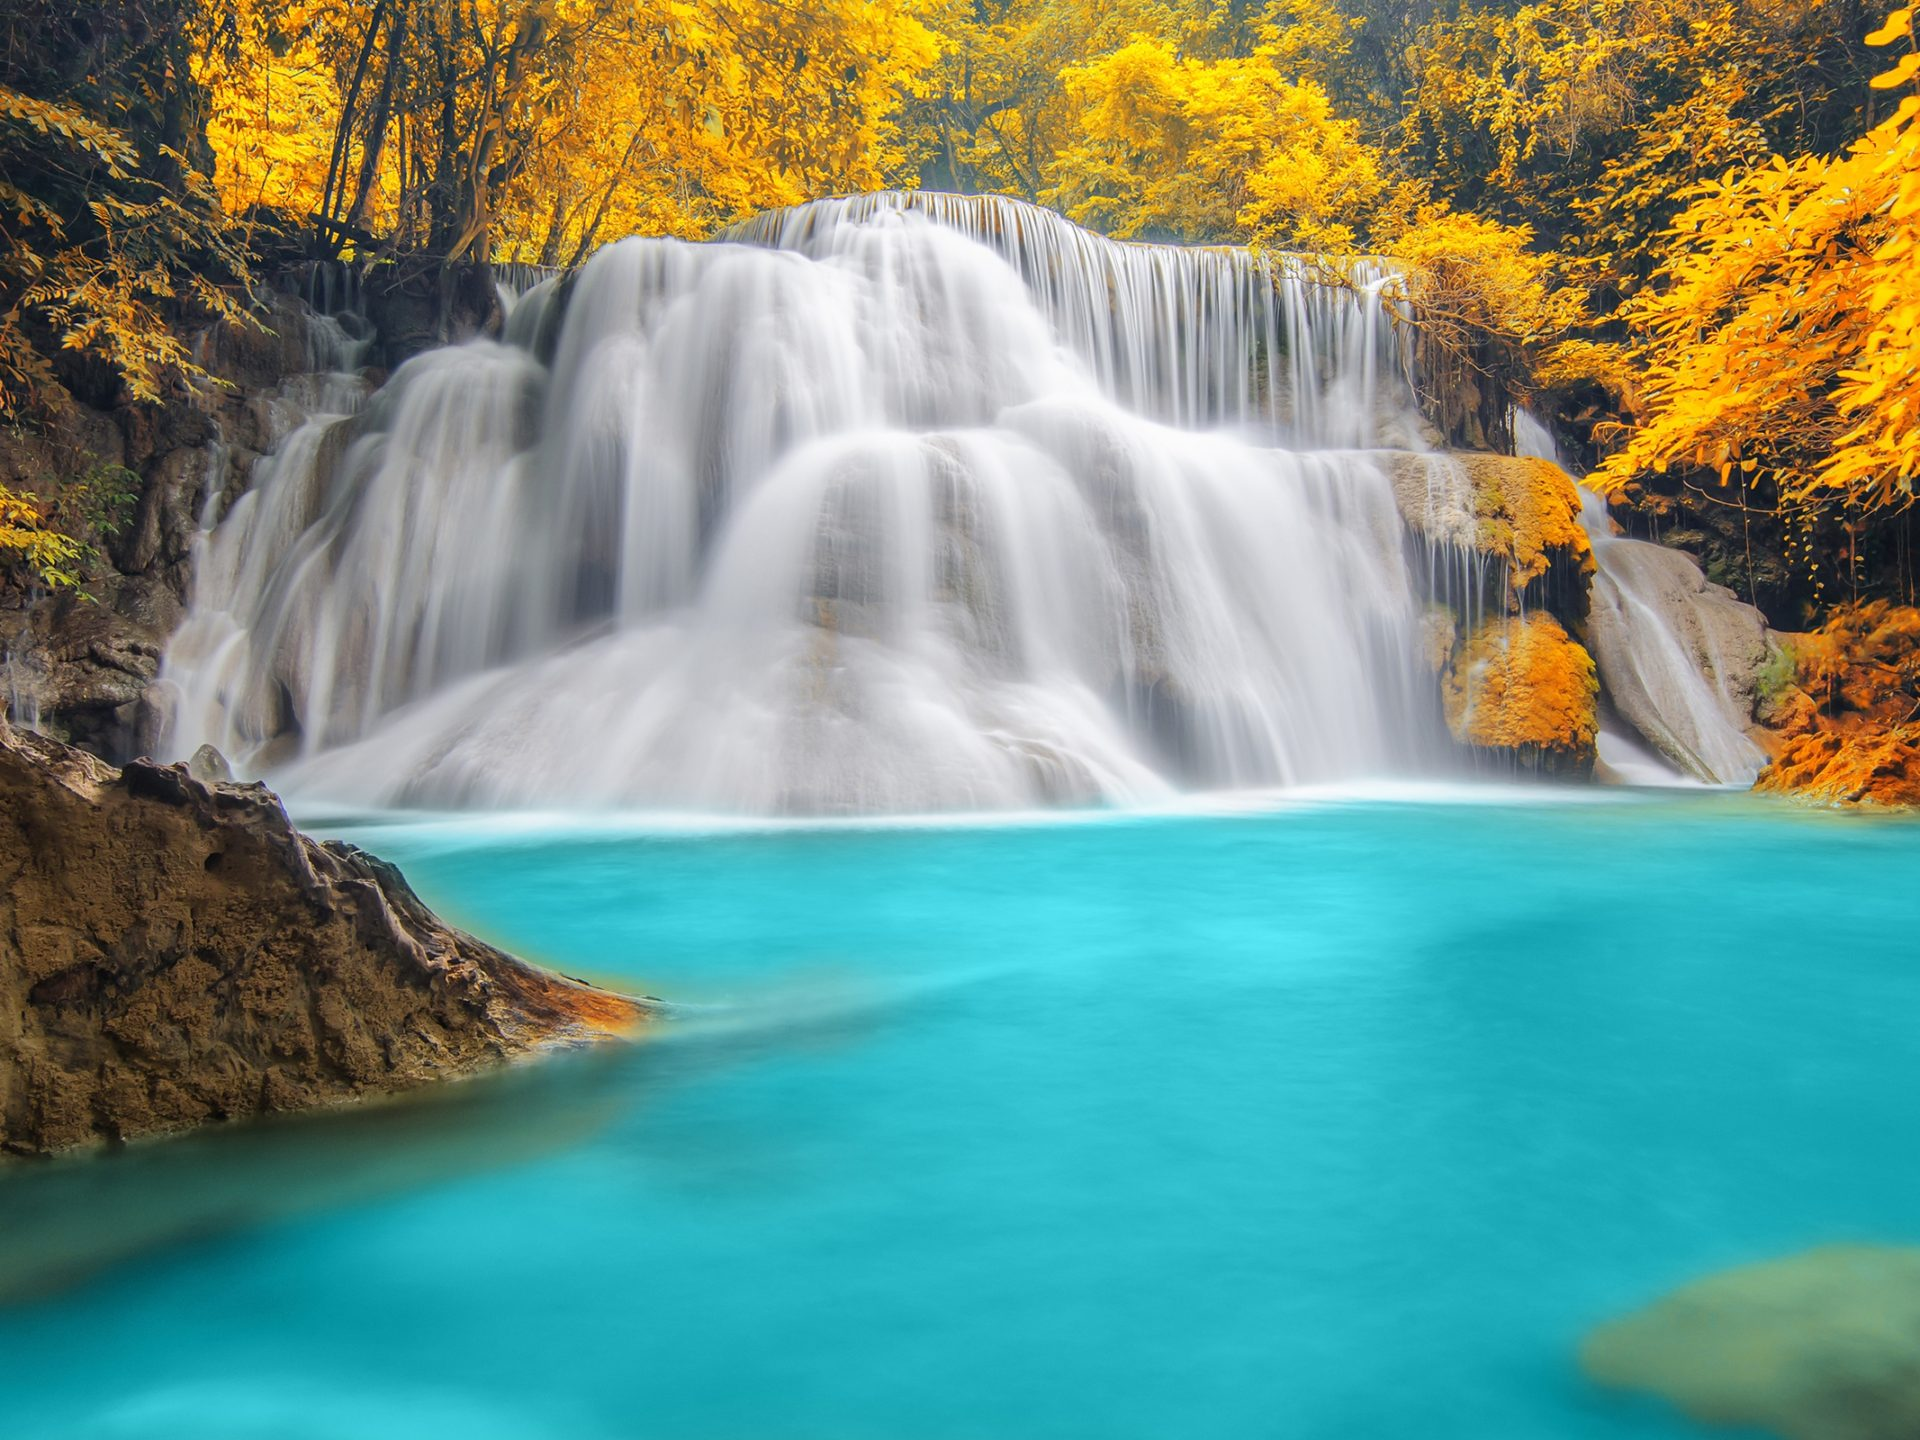 Free Desktop Wallpaper Niagara Falls Nature Wallpaper Forest Trees River Waterfall Blue Water